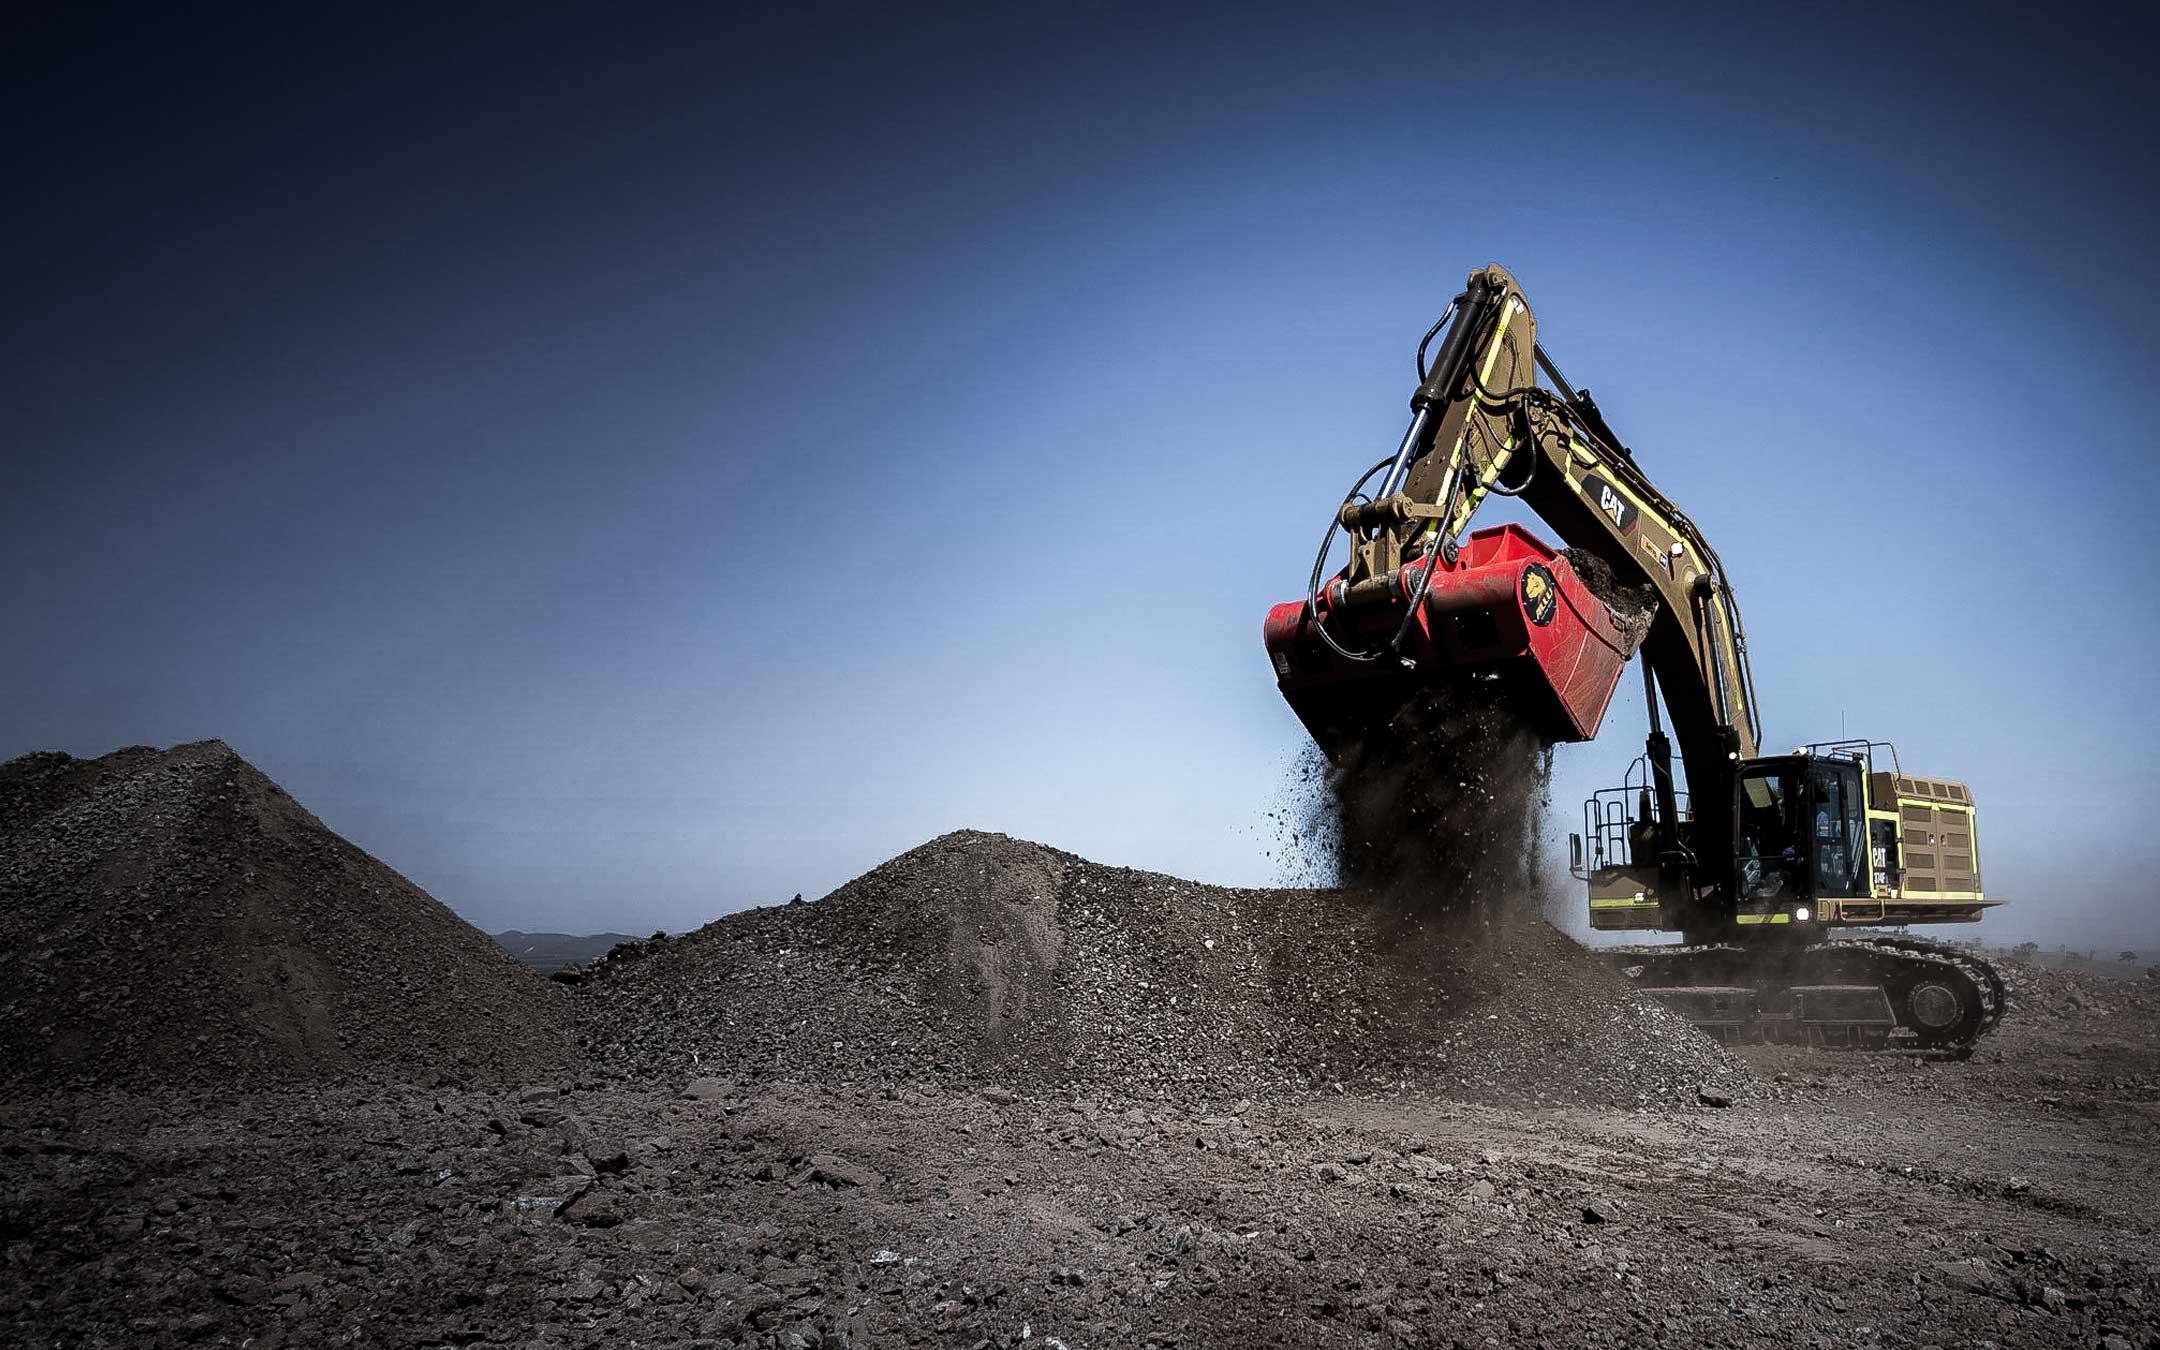 fotografia industrial mineracao 13